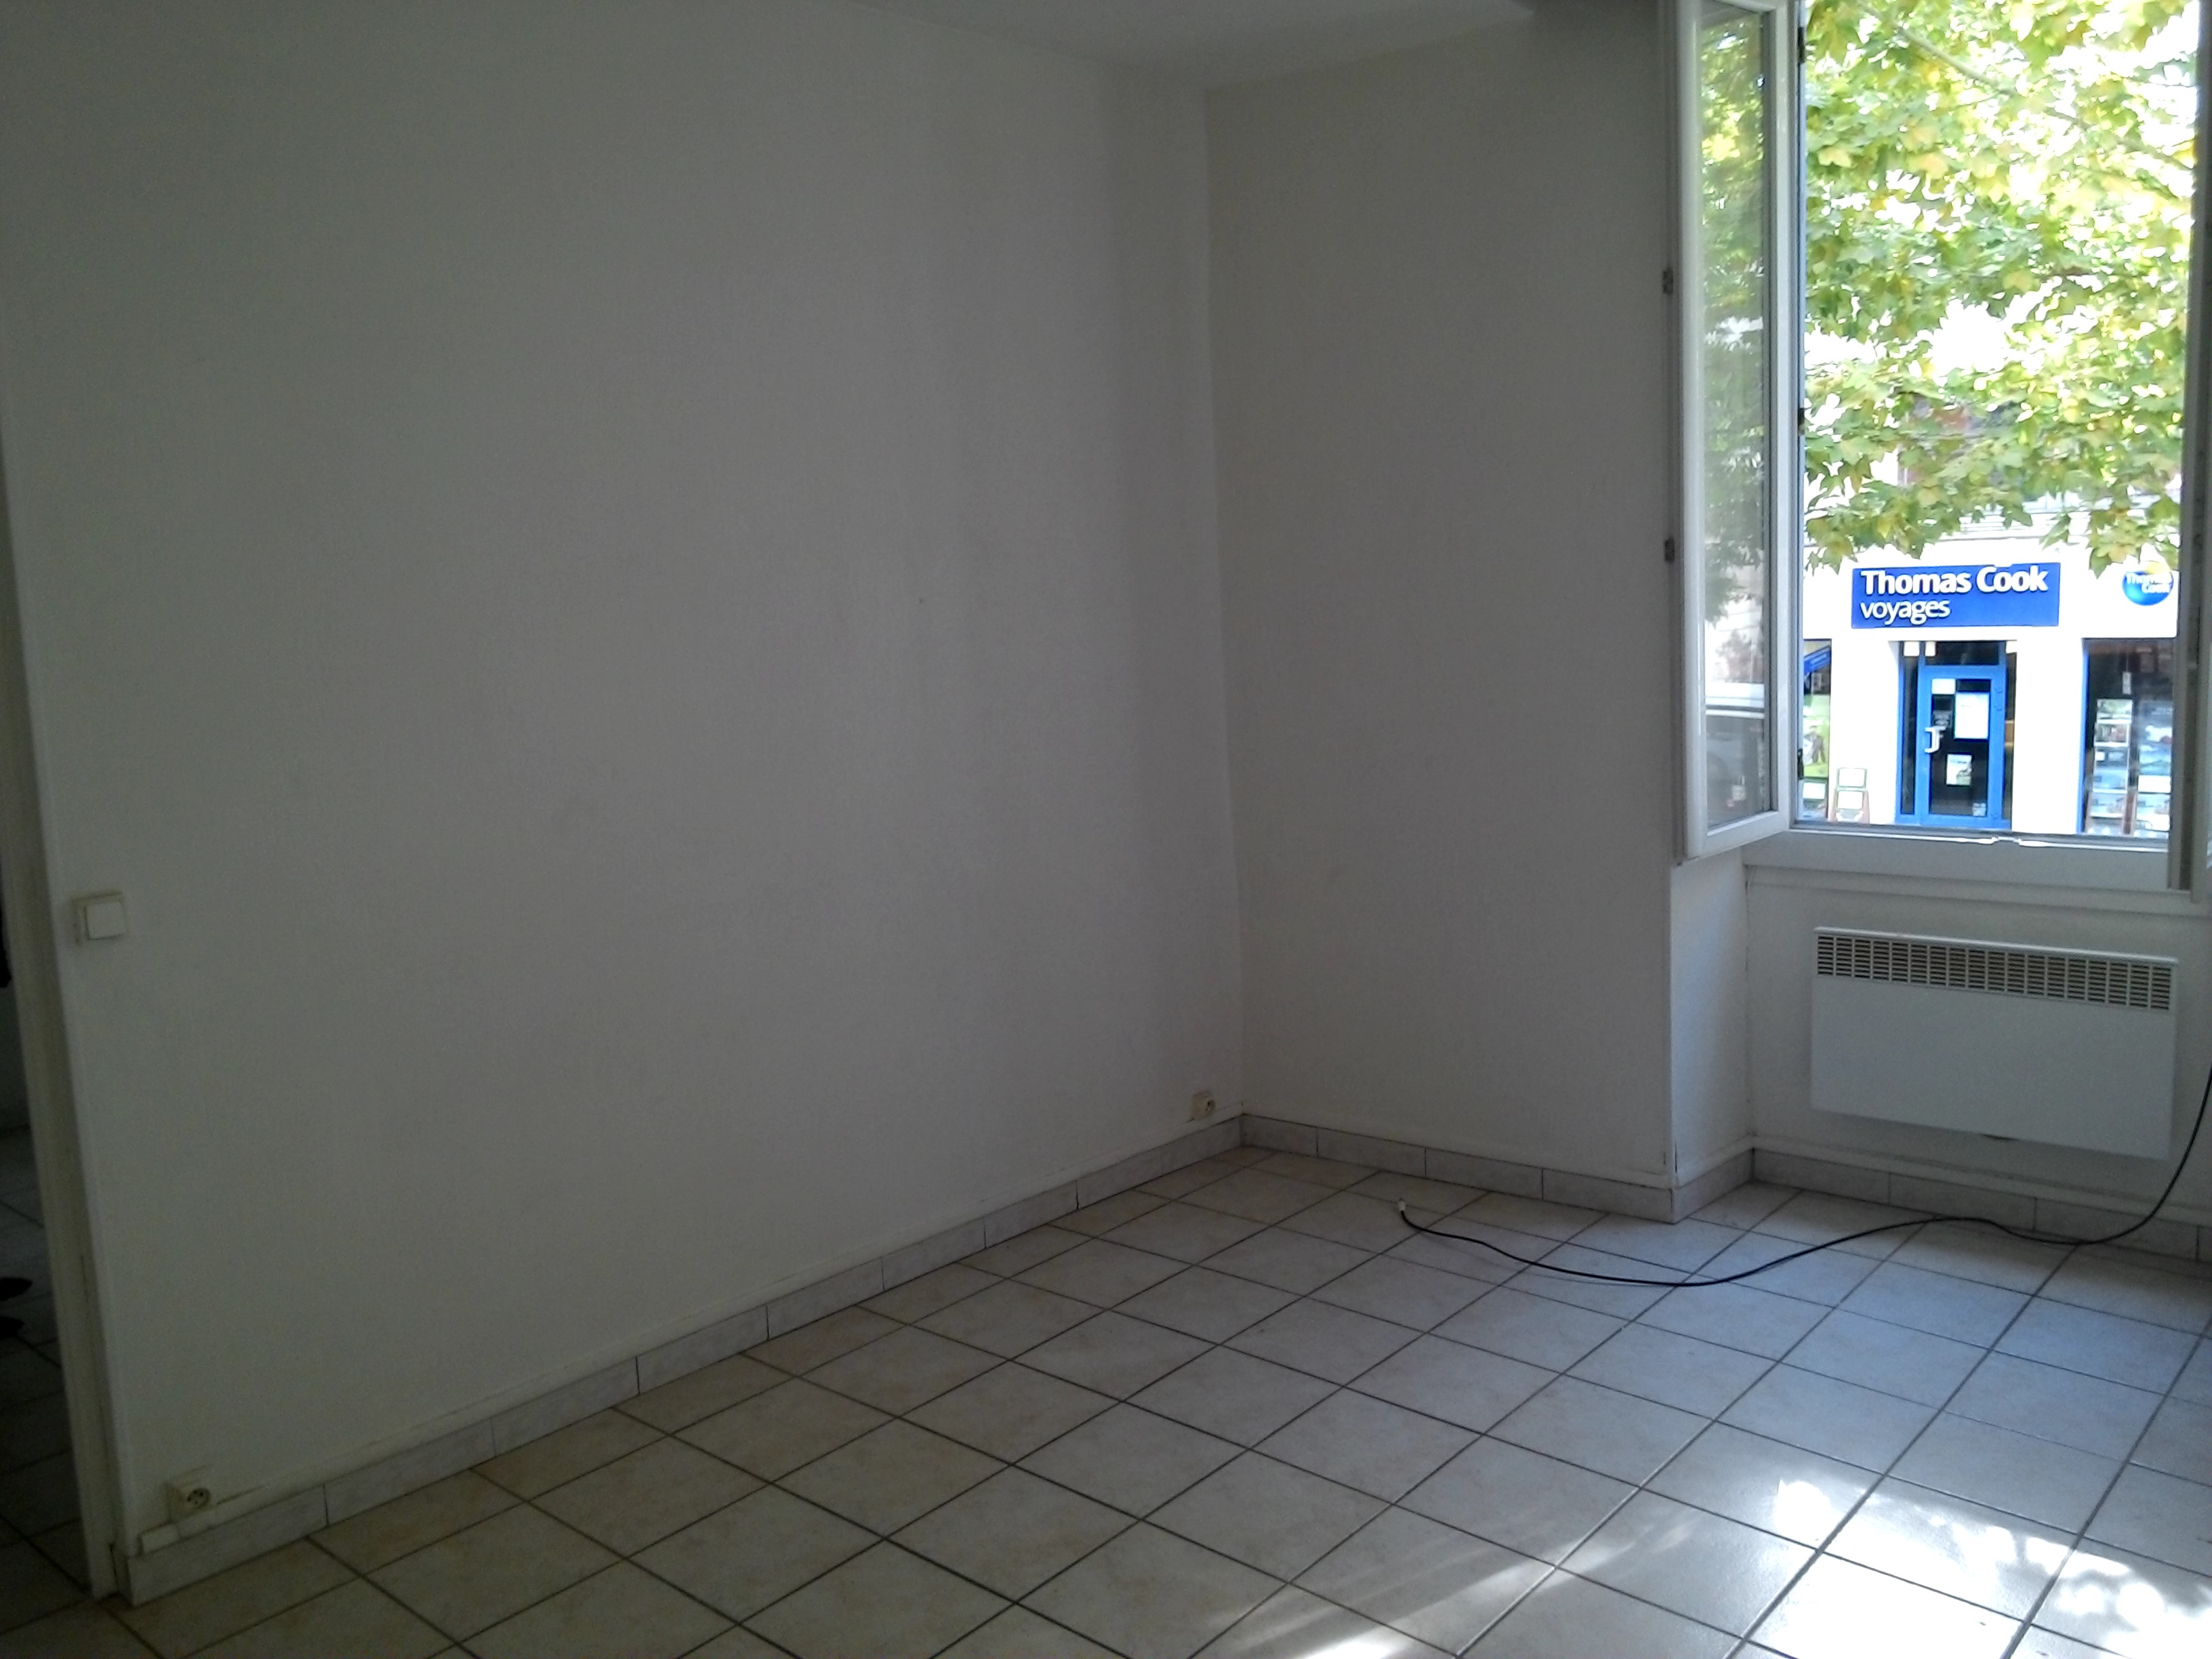 Cabinet arevimmobilier for Location t3 salon de provence